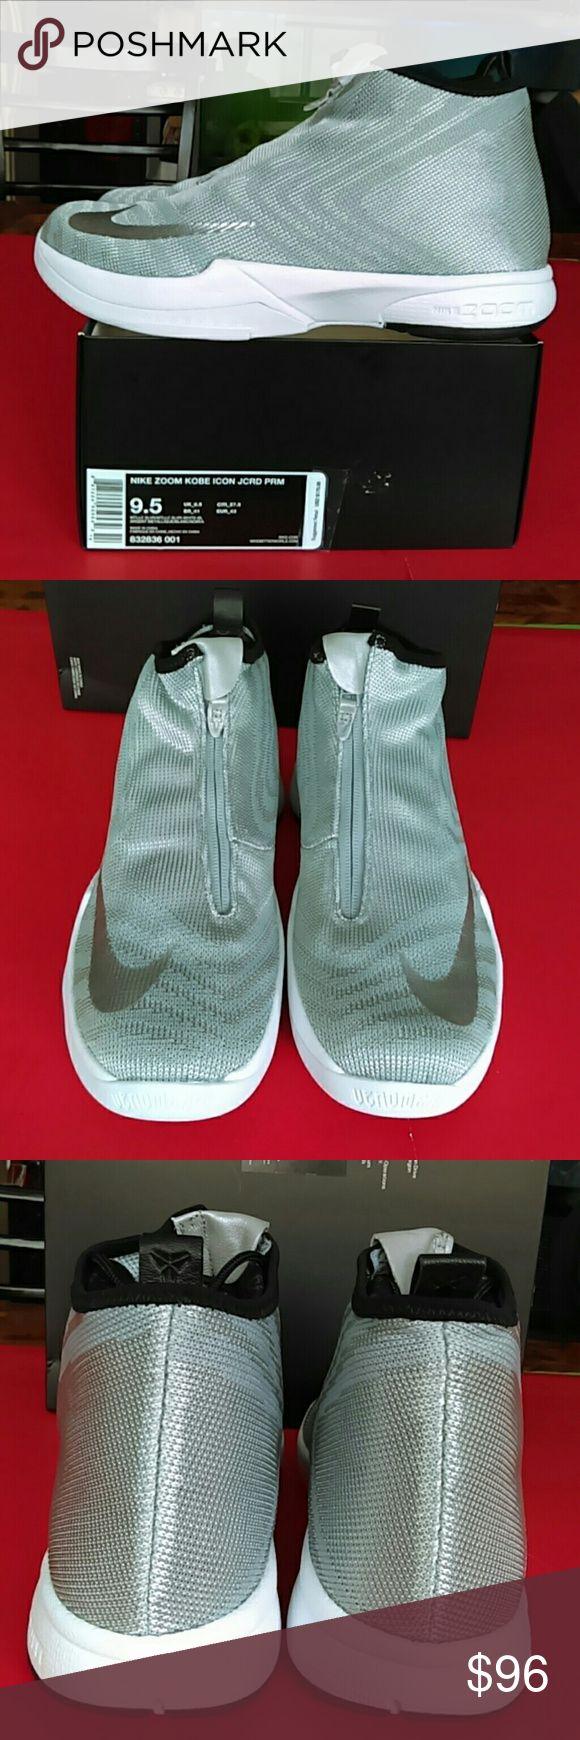 BRAND New NIKE KOBE  Men. Sneaker NIKE Zoom KOBE ICON JC RD PRM Metallic /Silver/White/Black Unisex. Men. 9.5. Women 11 Shoes Sneakers